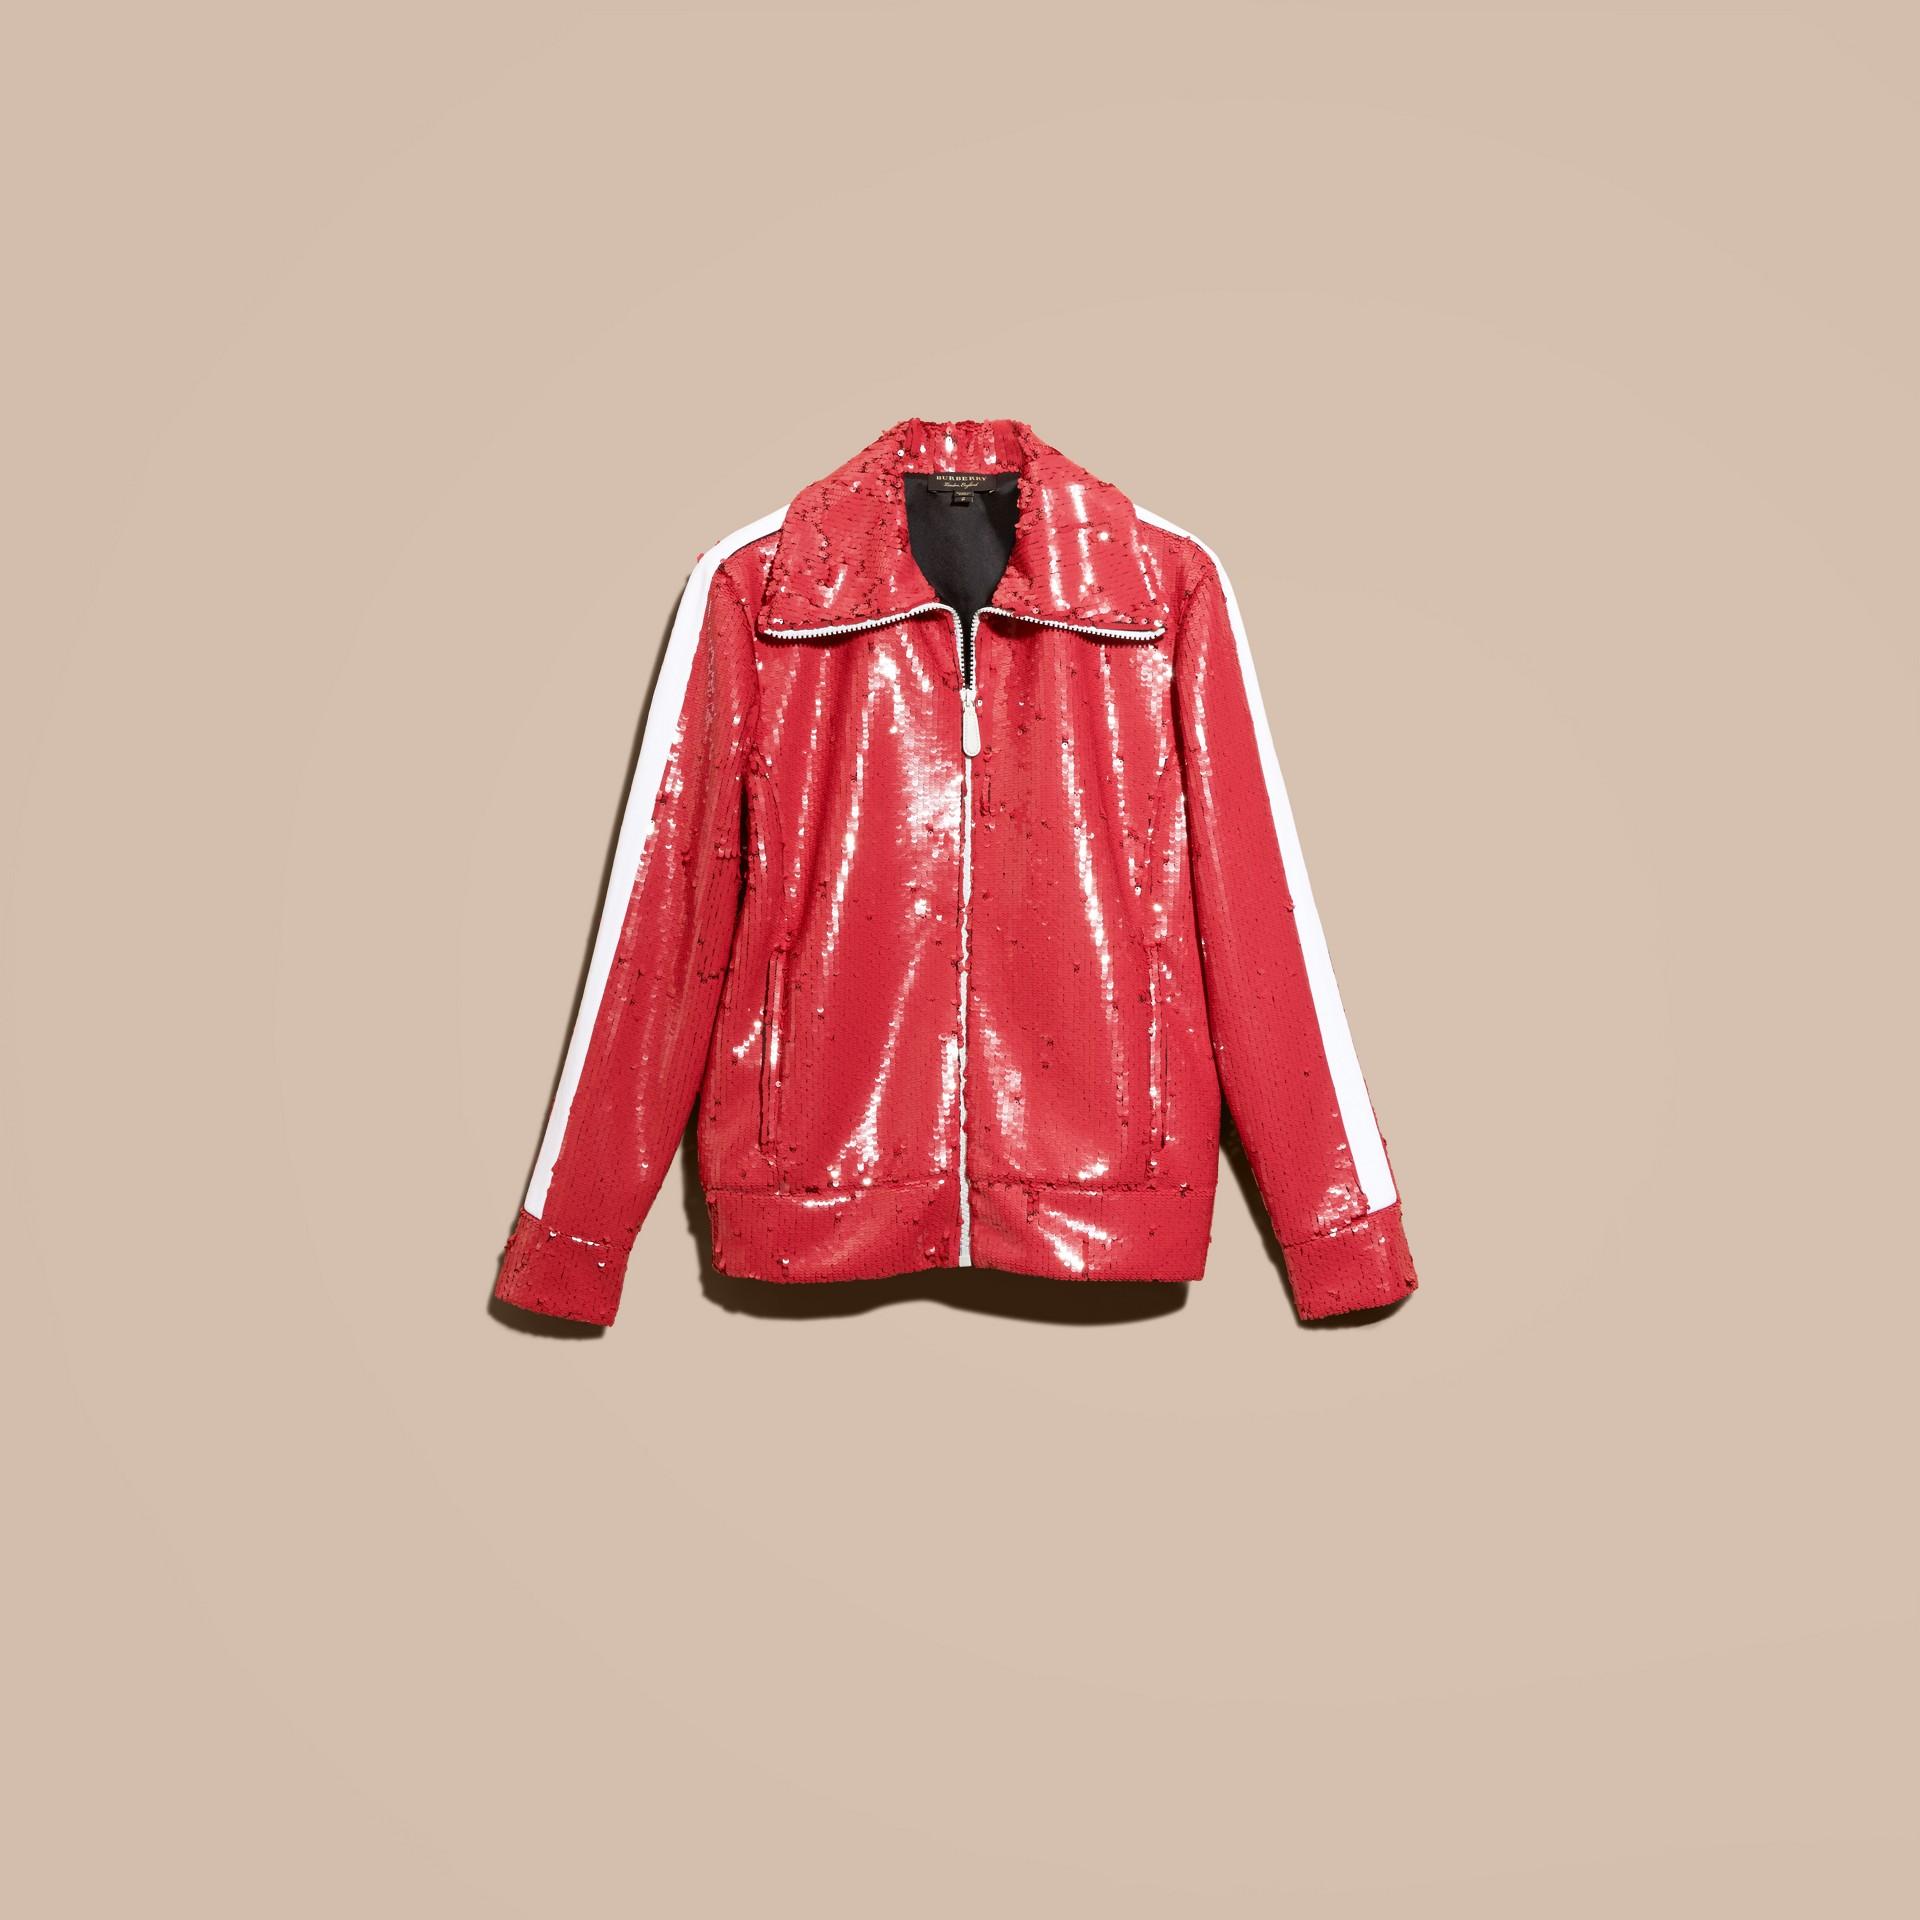 Cranberry-rot Trainingsjacke mit Pailletten - Galerie-Bild 4